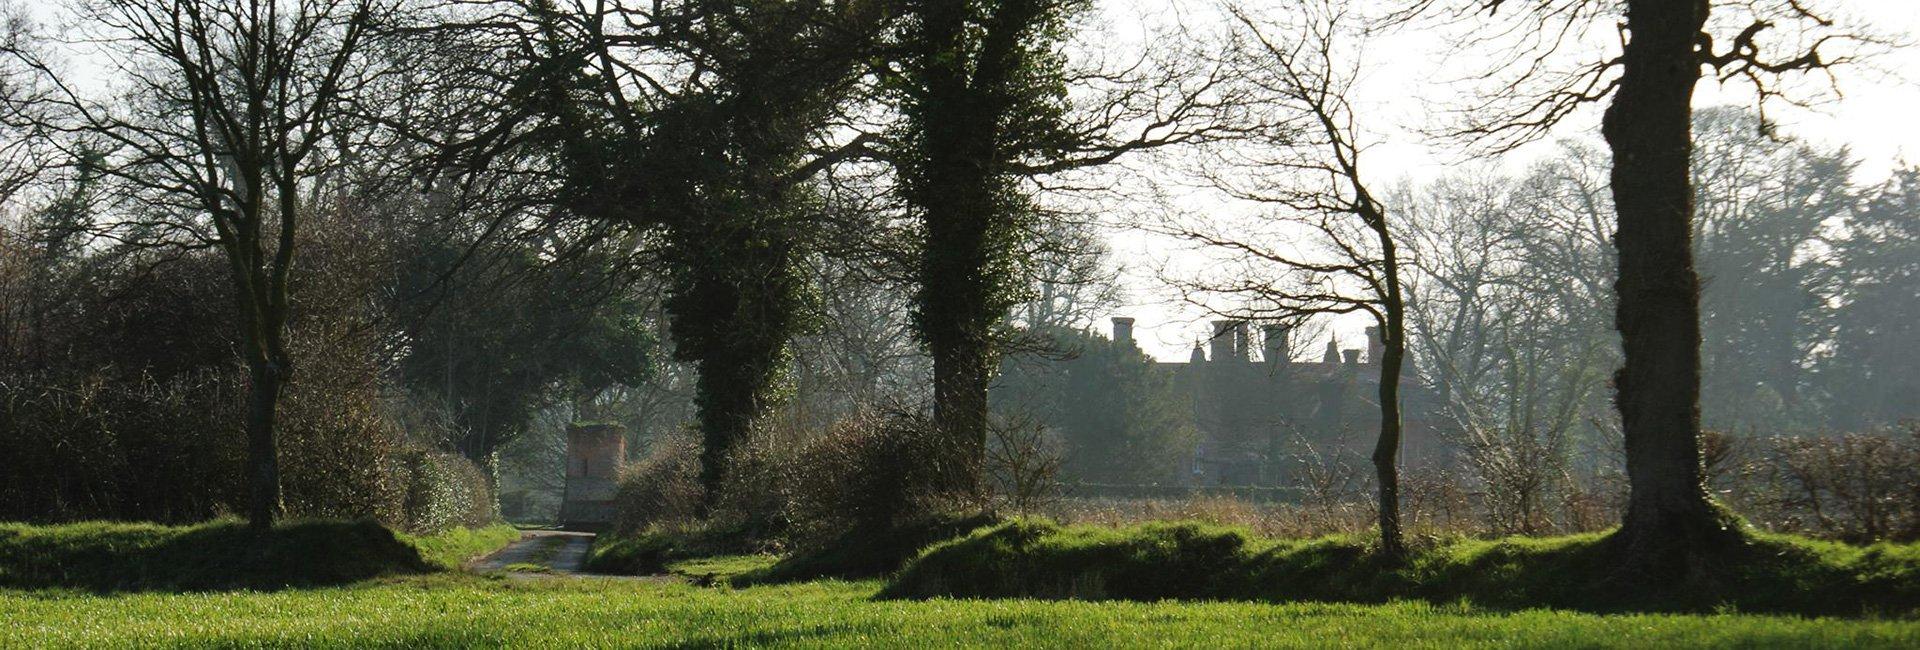 The area surrounding Bessingham Manor.